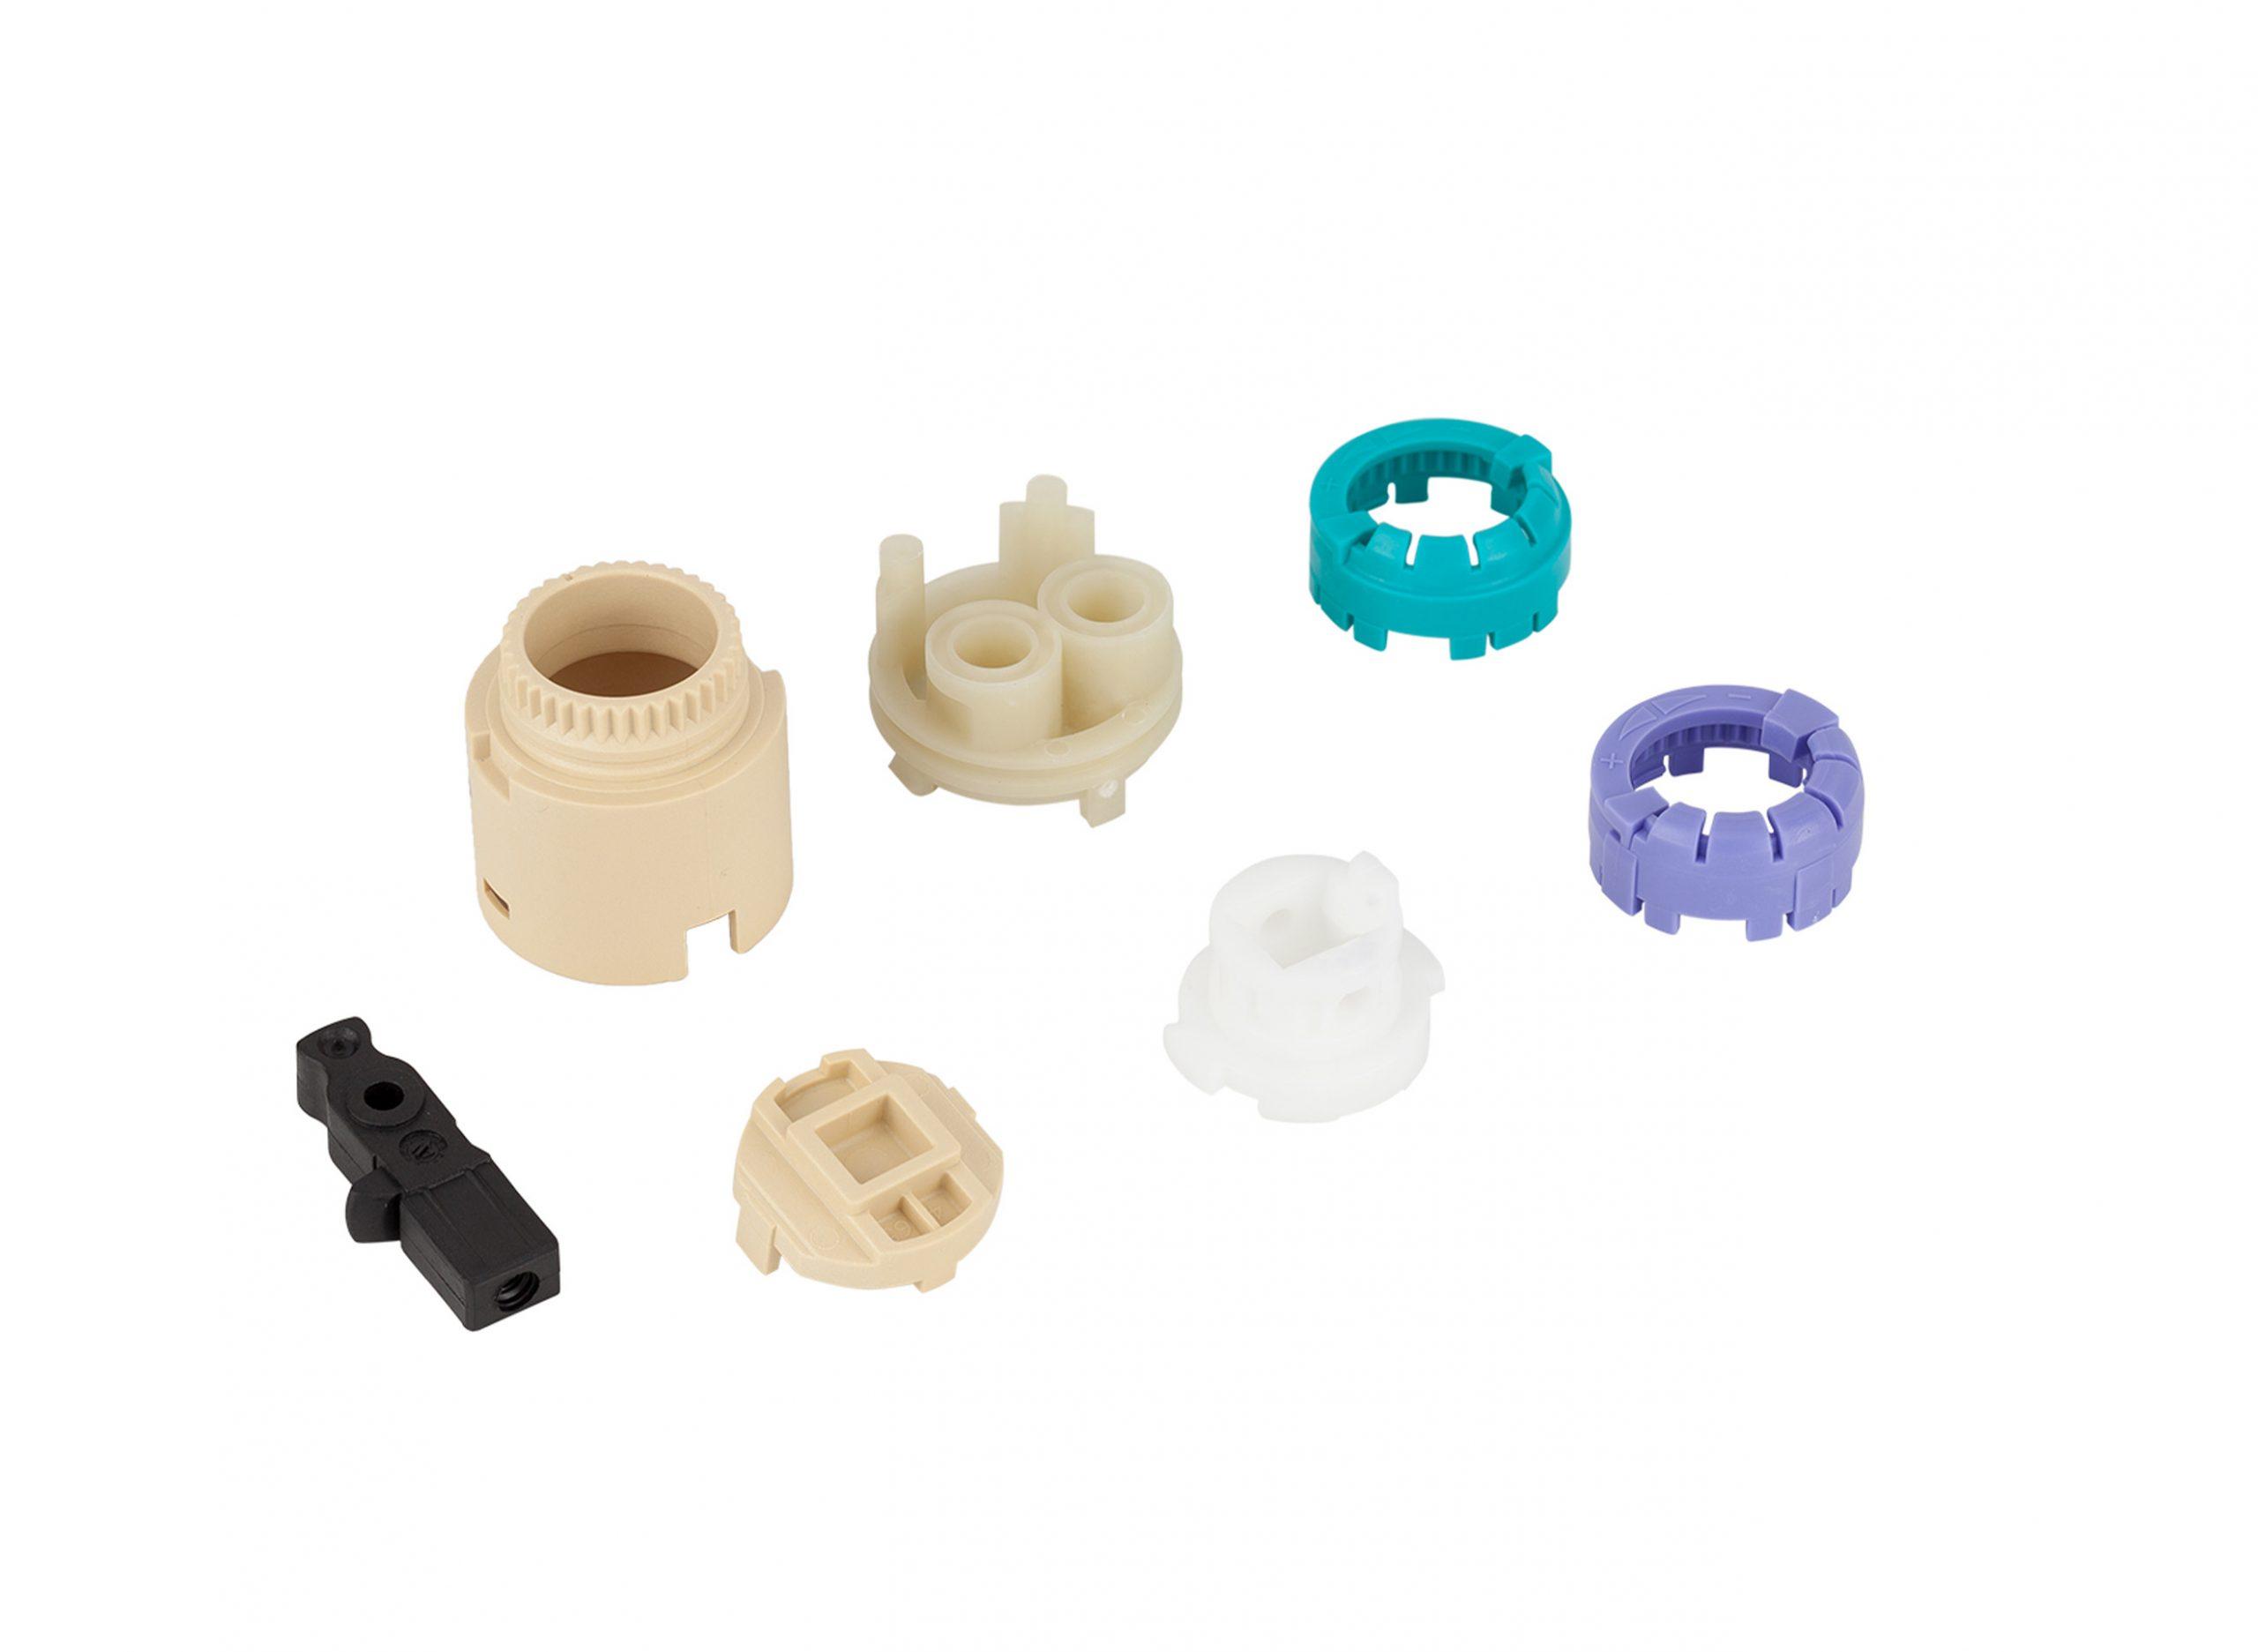 prifer-mold__0018_prifer-mold_40_0005_prifer-mold_77_0004_prifer_plastic_55